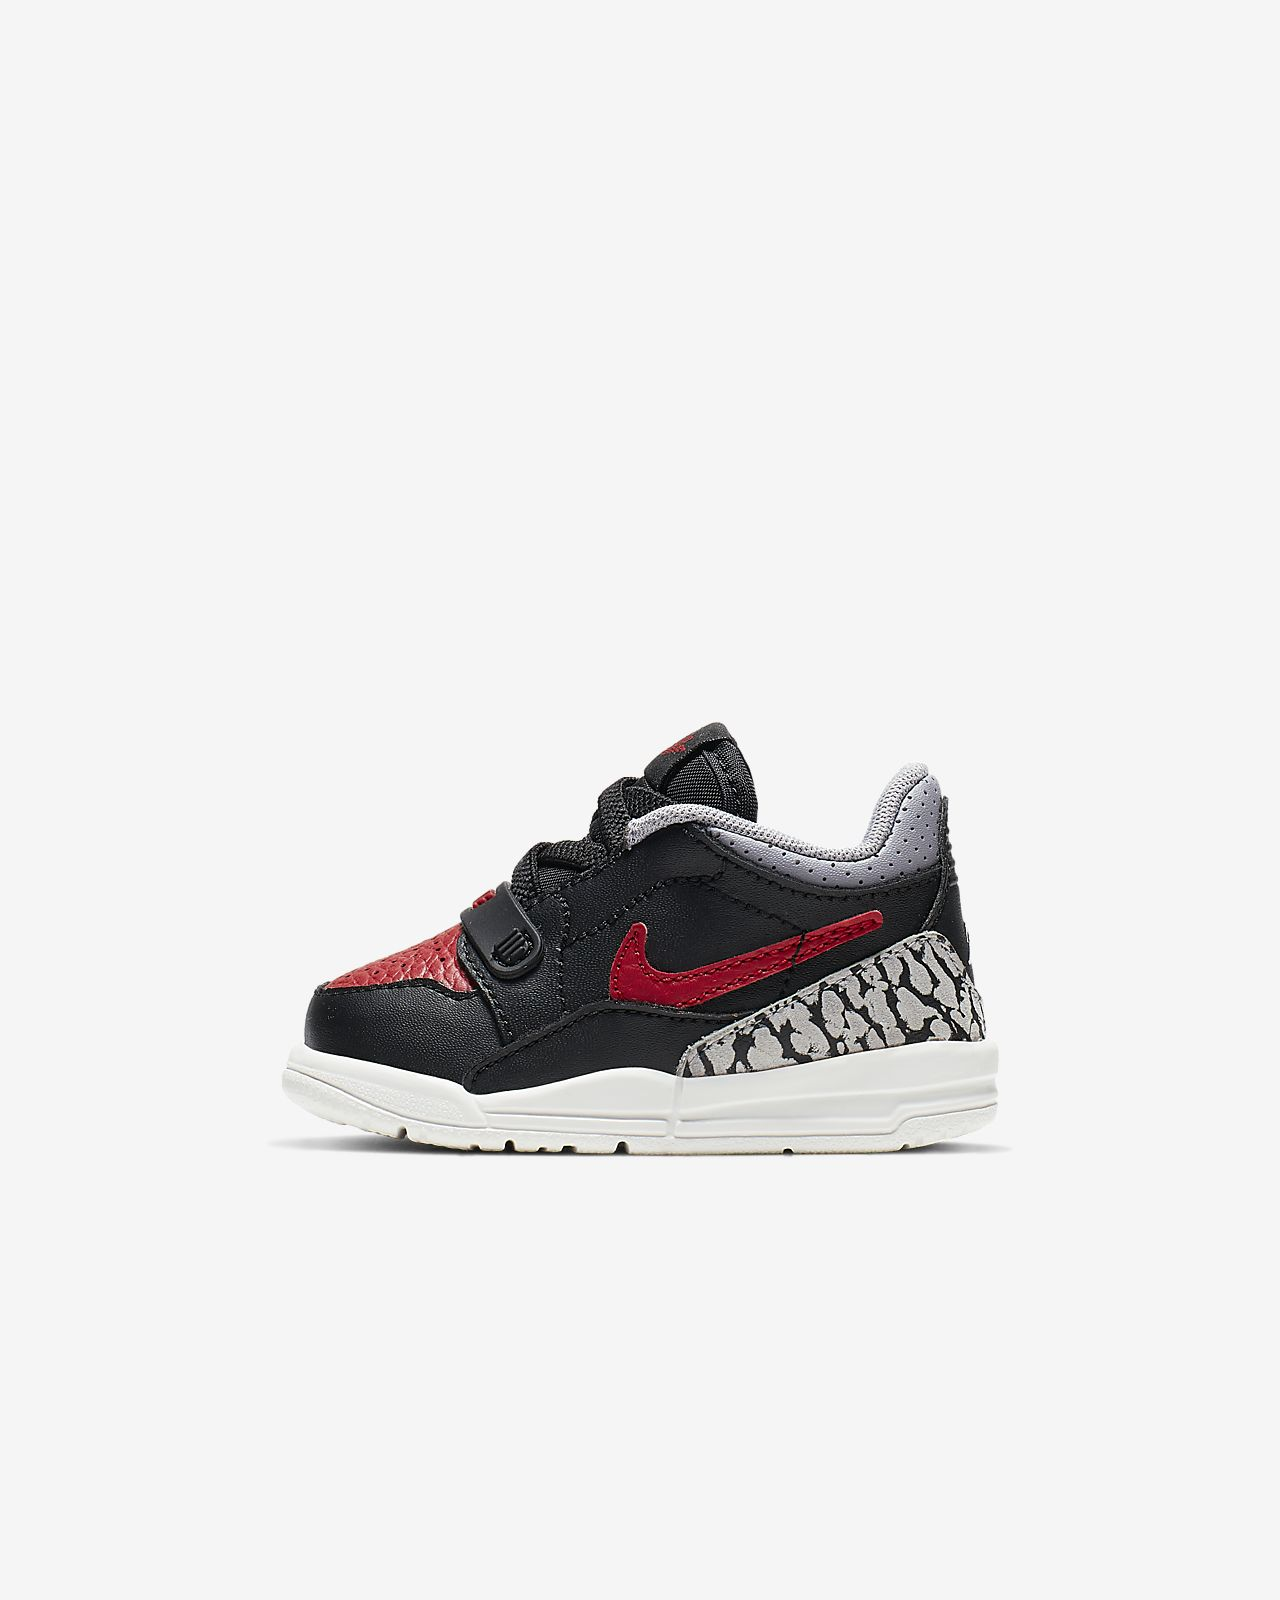 4f9cb1228b Buty dla niemowląt   maluchów Air Jordan Legacy 312 Low. Nike.com PL